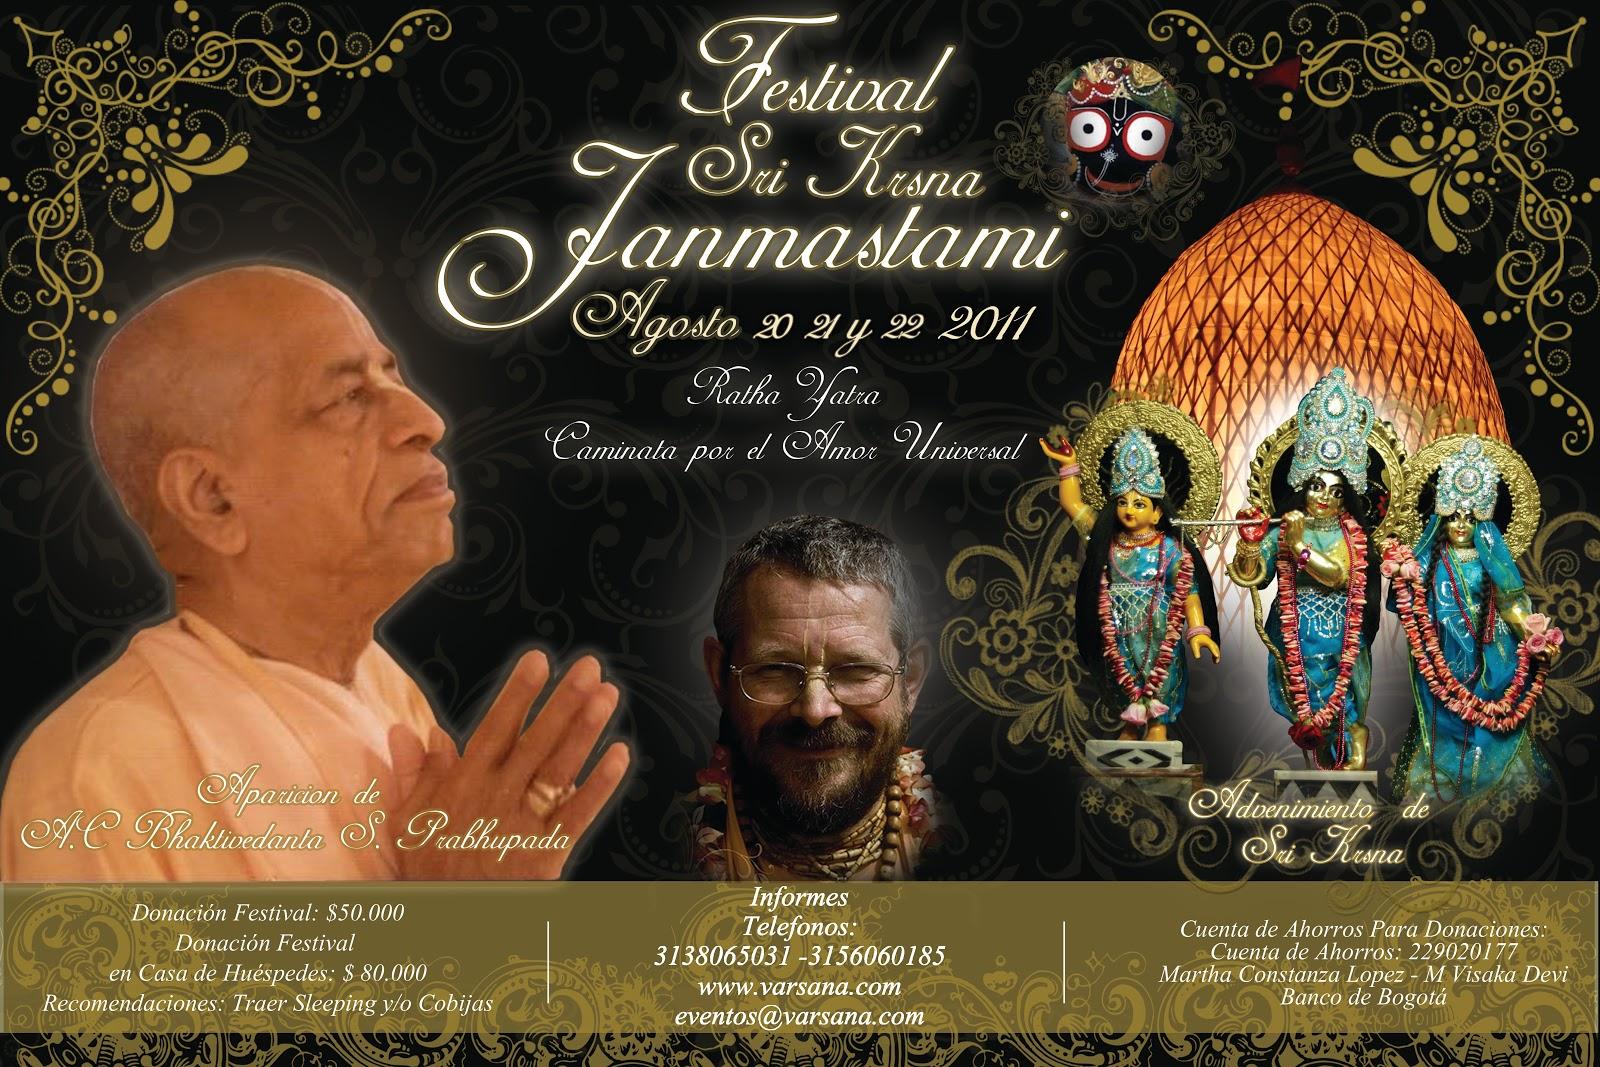 http://1.bp.blogspot.com/-vgpNDyP07gs/ThzqVlCQuoI/AAAAAAAAAPU/YwvgRBLr-z4/s1600/Afiche+Final+Sri+Janmastami+0003+copia.jpg